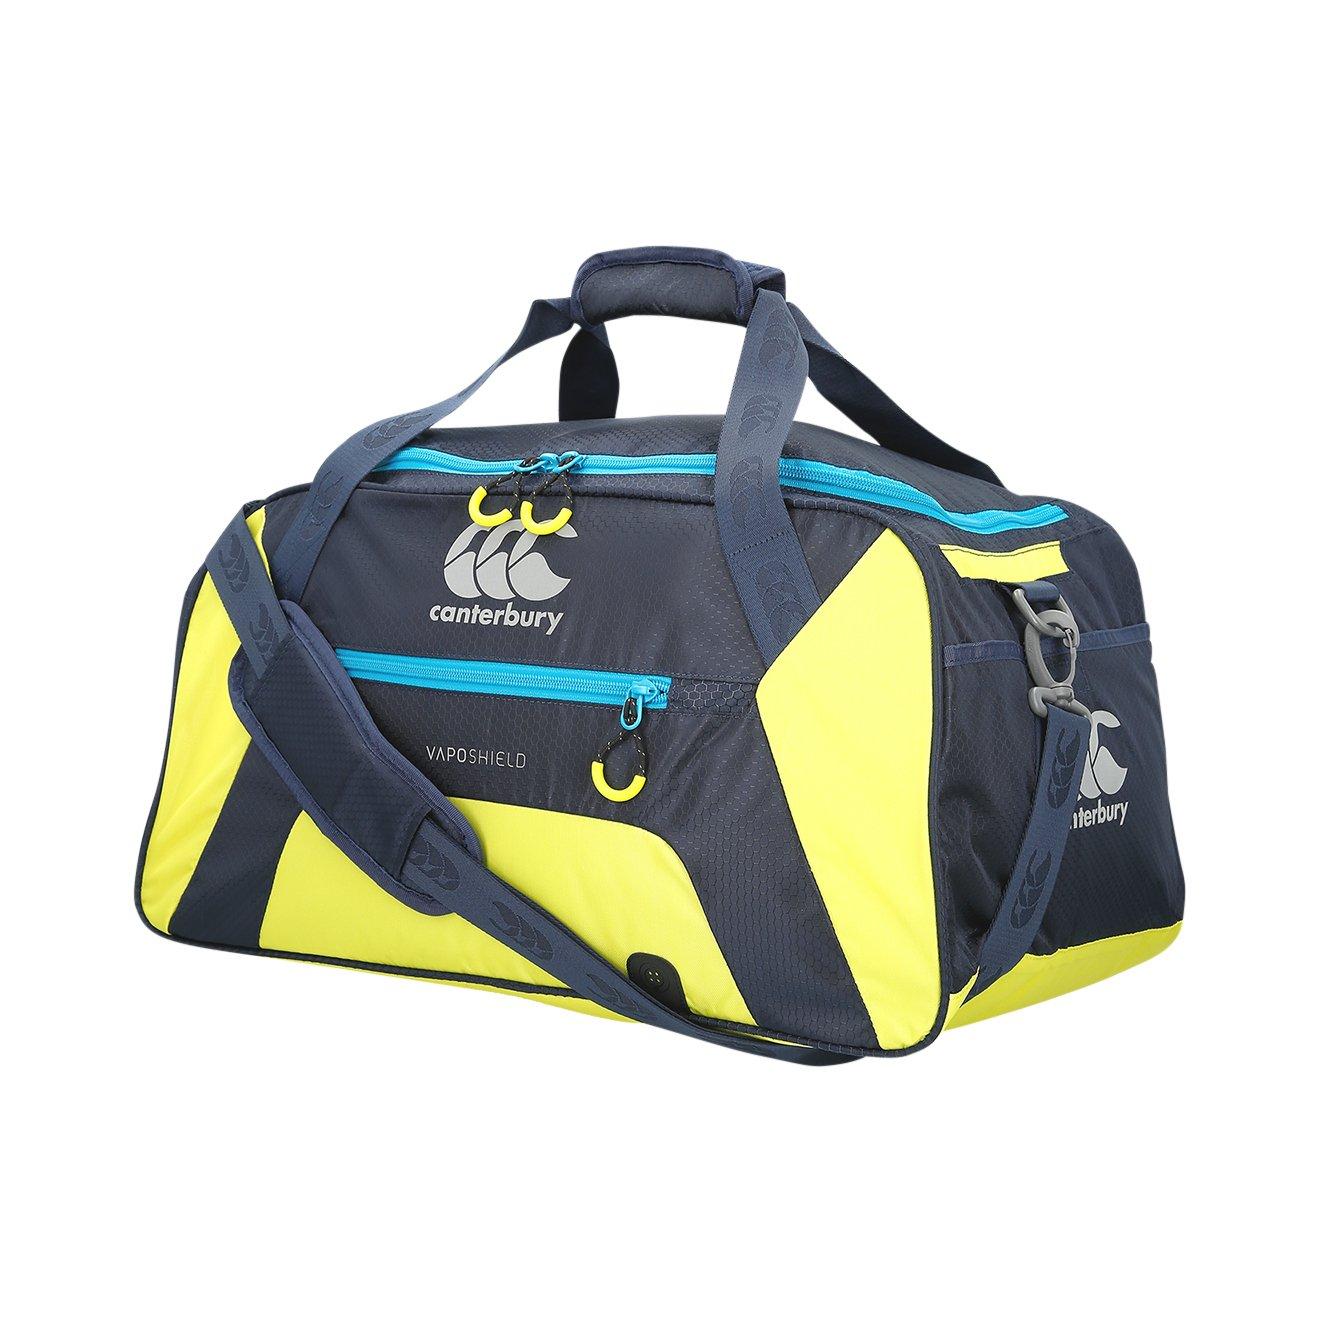 794c3173b5 Canterbury Unisex Vapodri Raze Flex Duffle Sports Bag